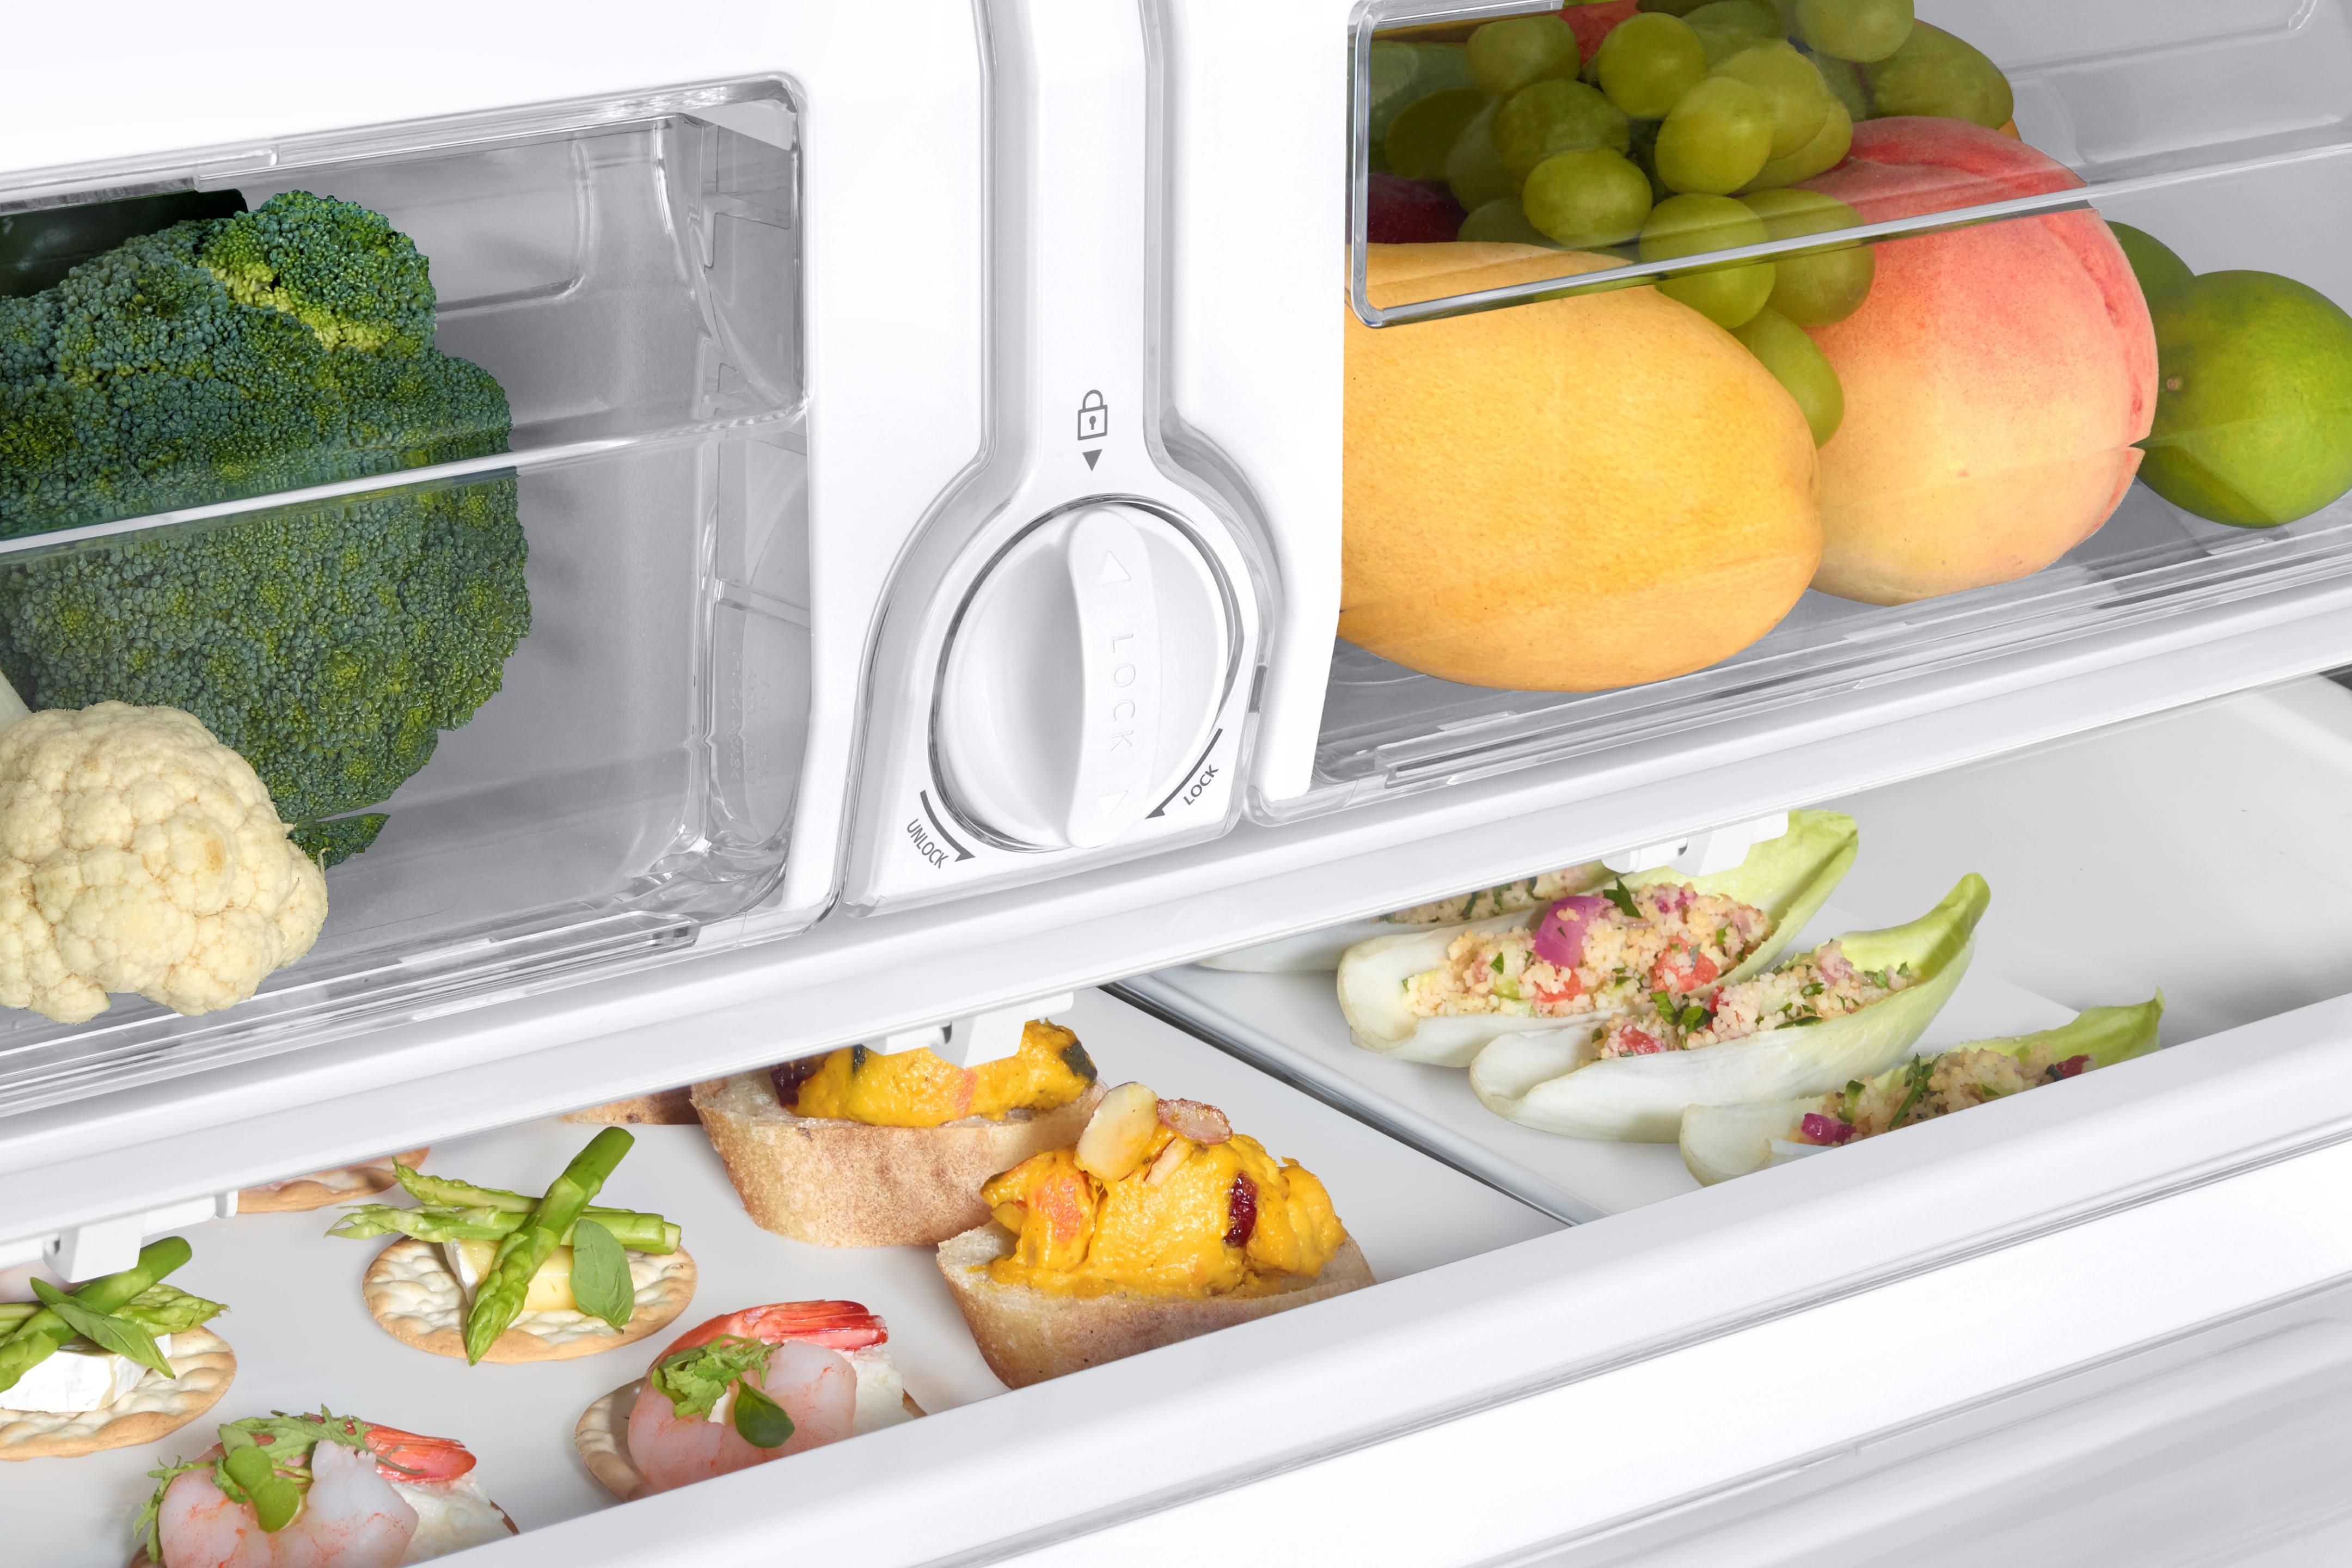 Samsung RF26J7500SR/AA 25.5 cu. ft. Capacity 3-Door French Door Refrigerator with CoolSelect Pantry™ - Stainless Steel